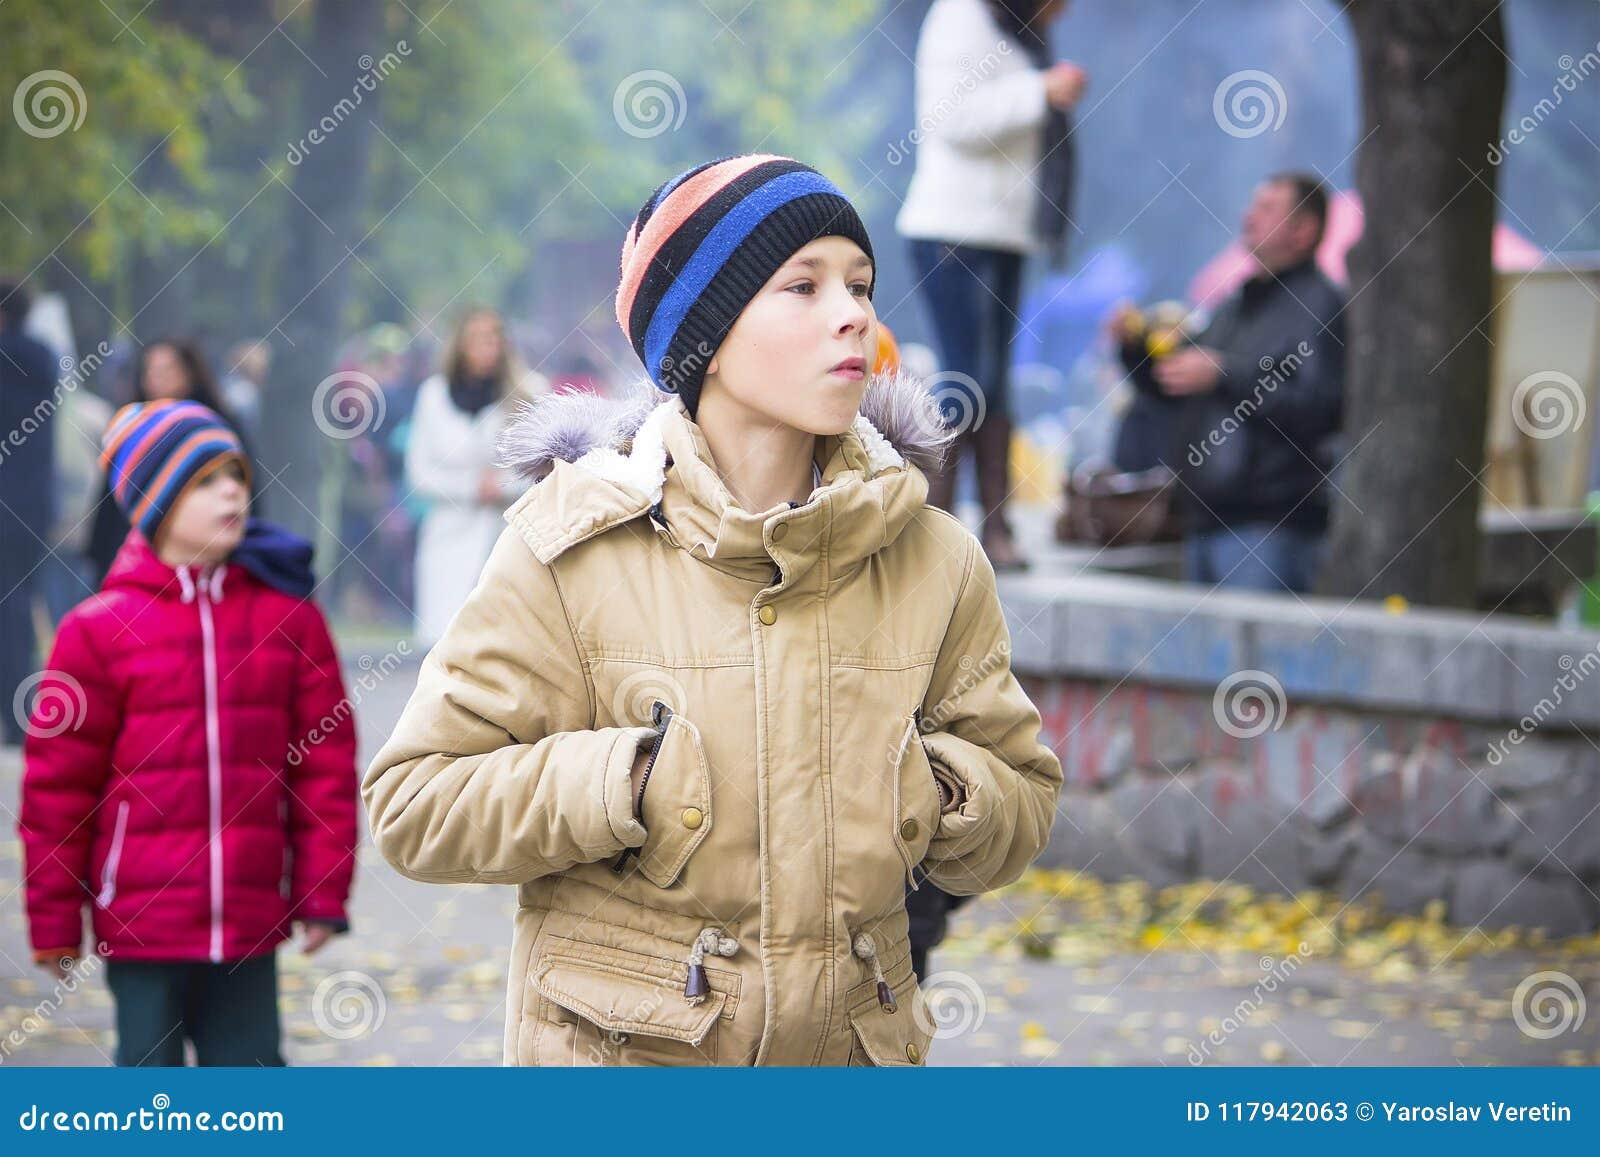 Un garçon regarde l événement